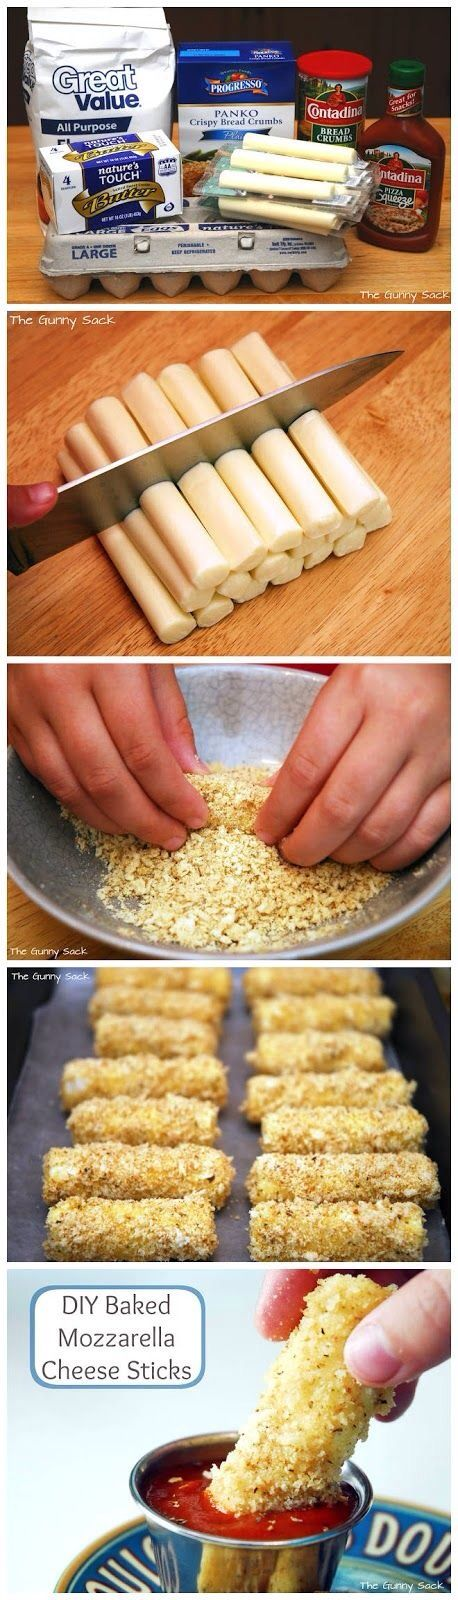 air max ltd ii mens trainers Baked Mozzarella Cheese Sticks Recipe